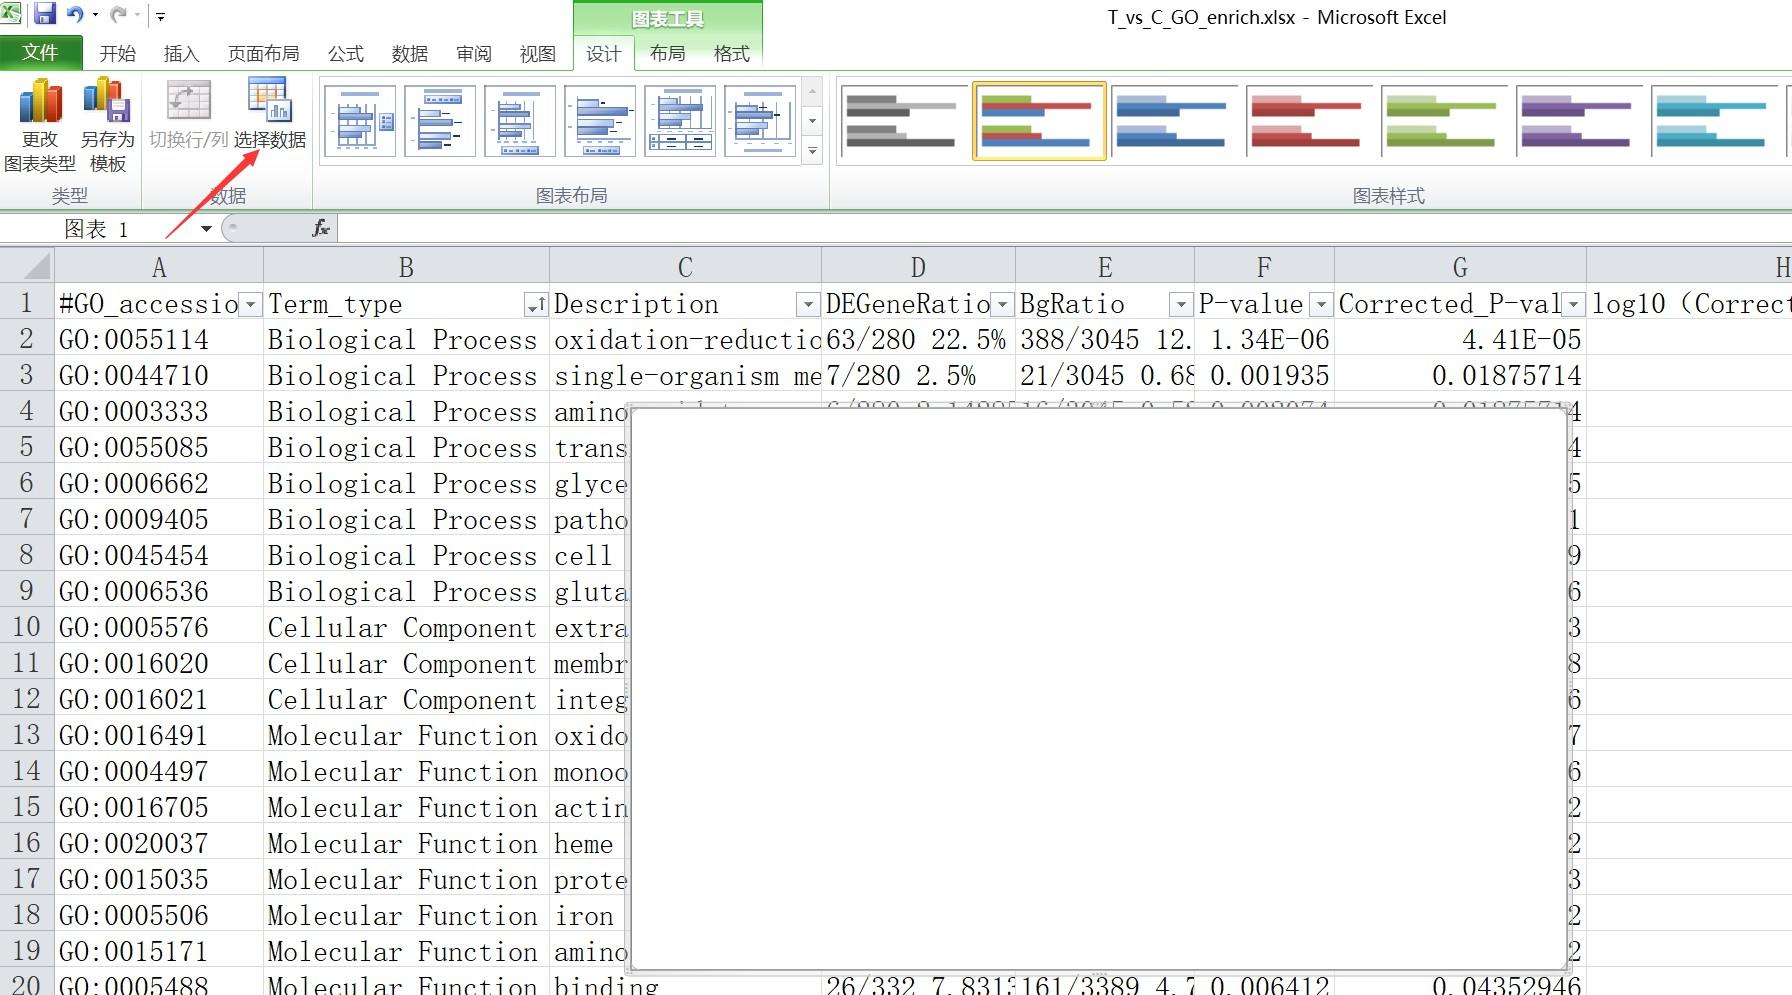 attachments-2020-05-Oc3Ud0x75ecdc9f5ade31.png